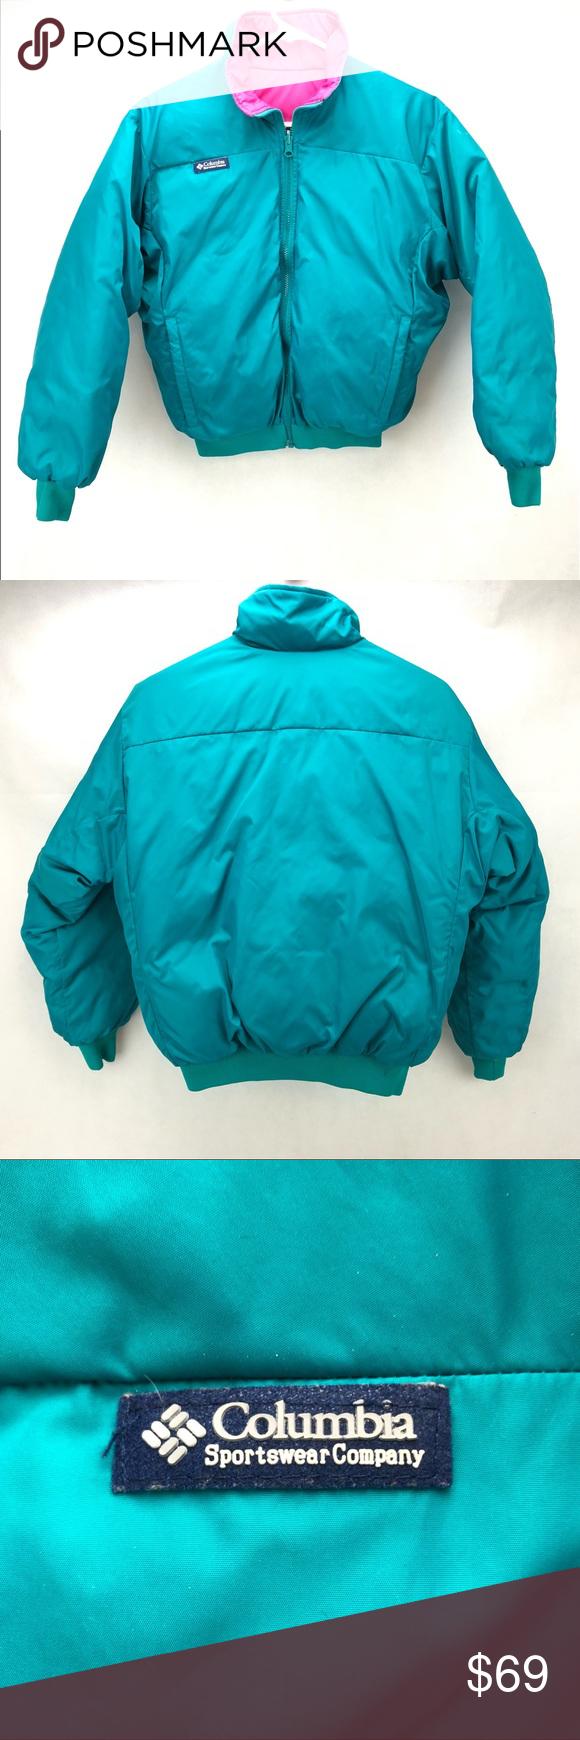 Vintage Columbia Reversible Winter Jacket Coat | Clothes